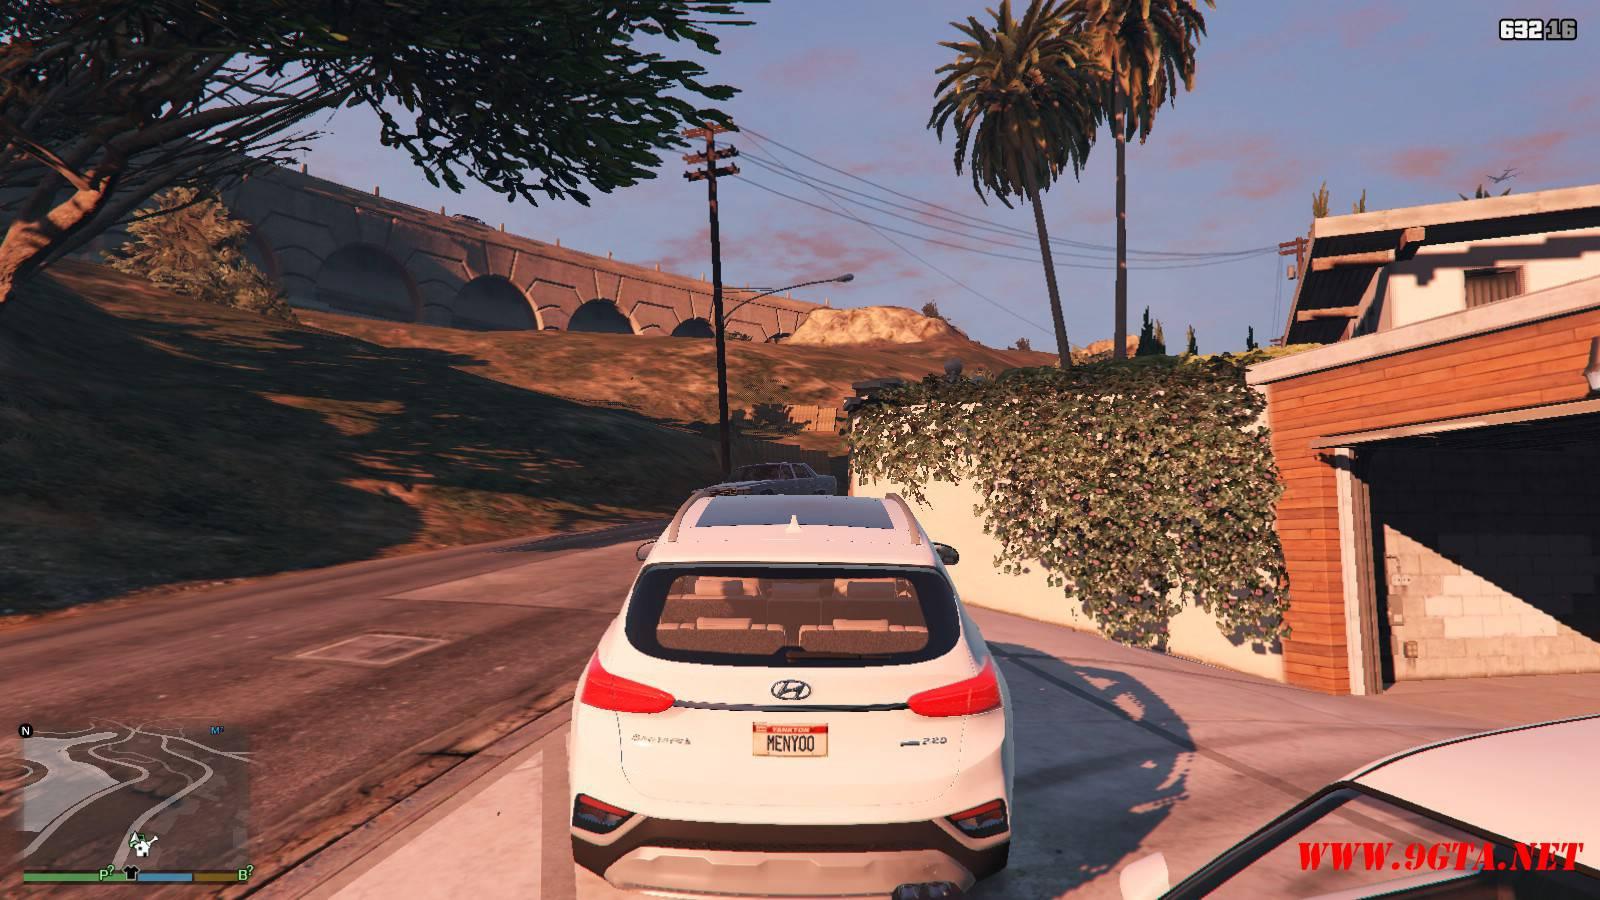 2019 Huyndai Santa Fe GTA5 mods (3)